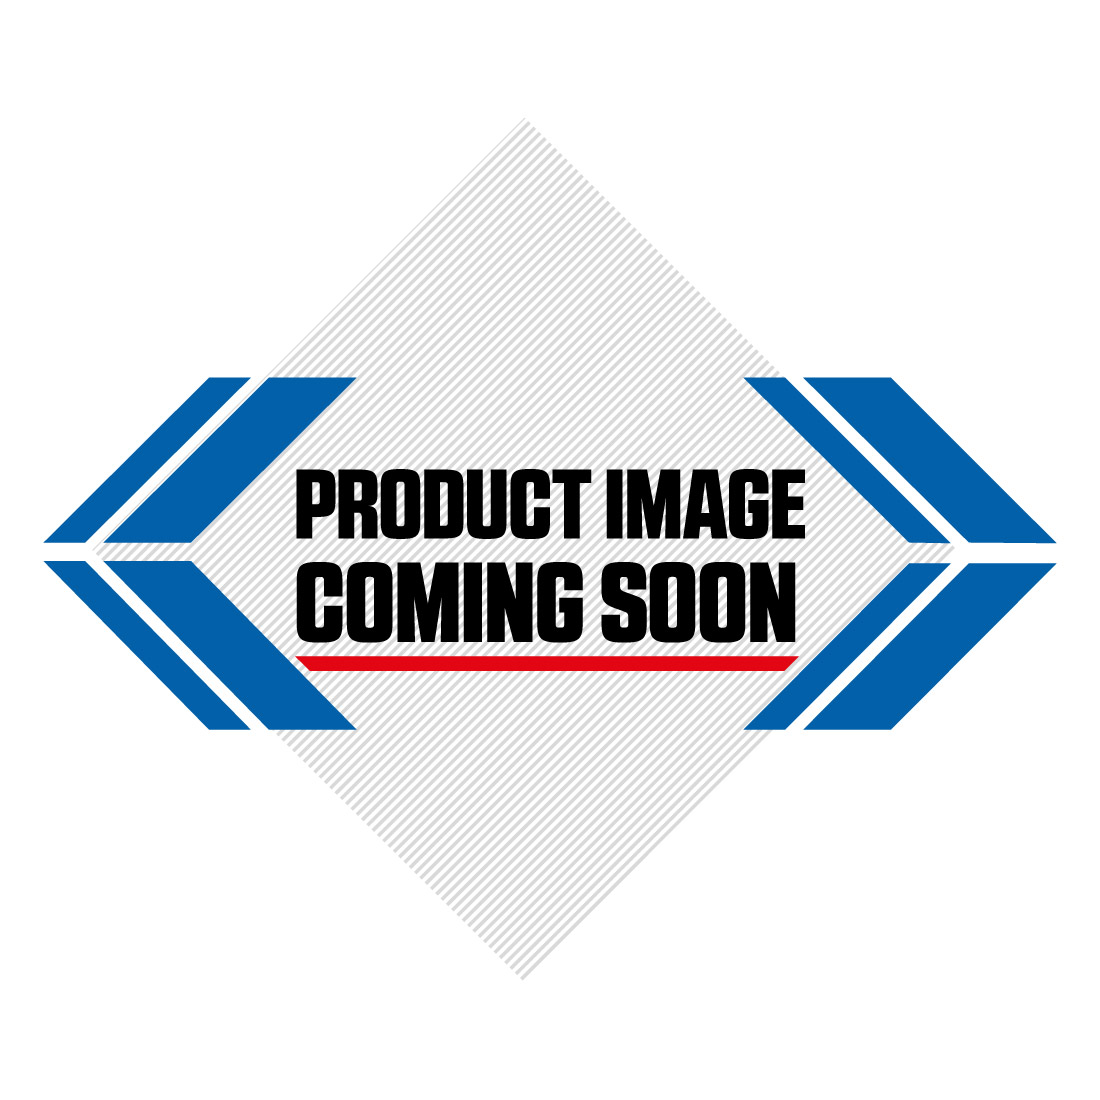 Suzuki Plastic Kit RMZ 450 (08-17) Black Image-4